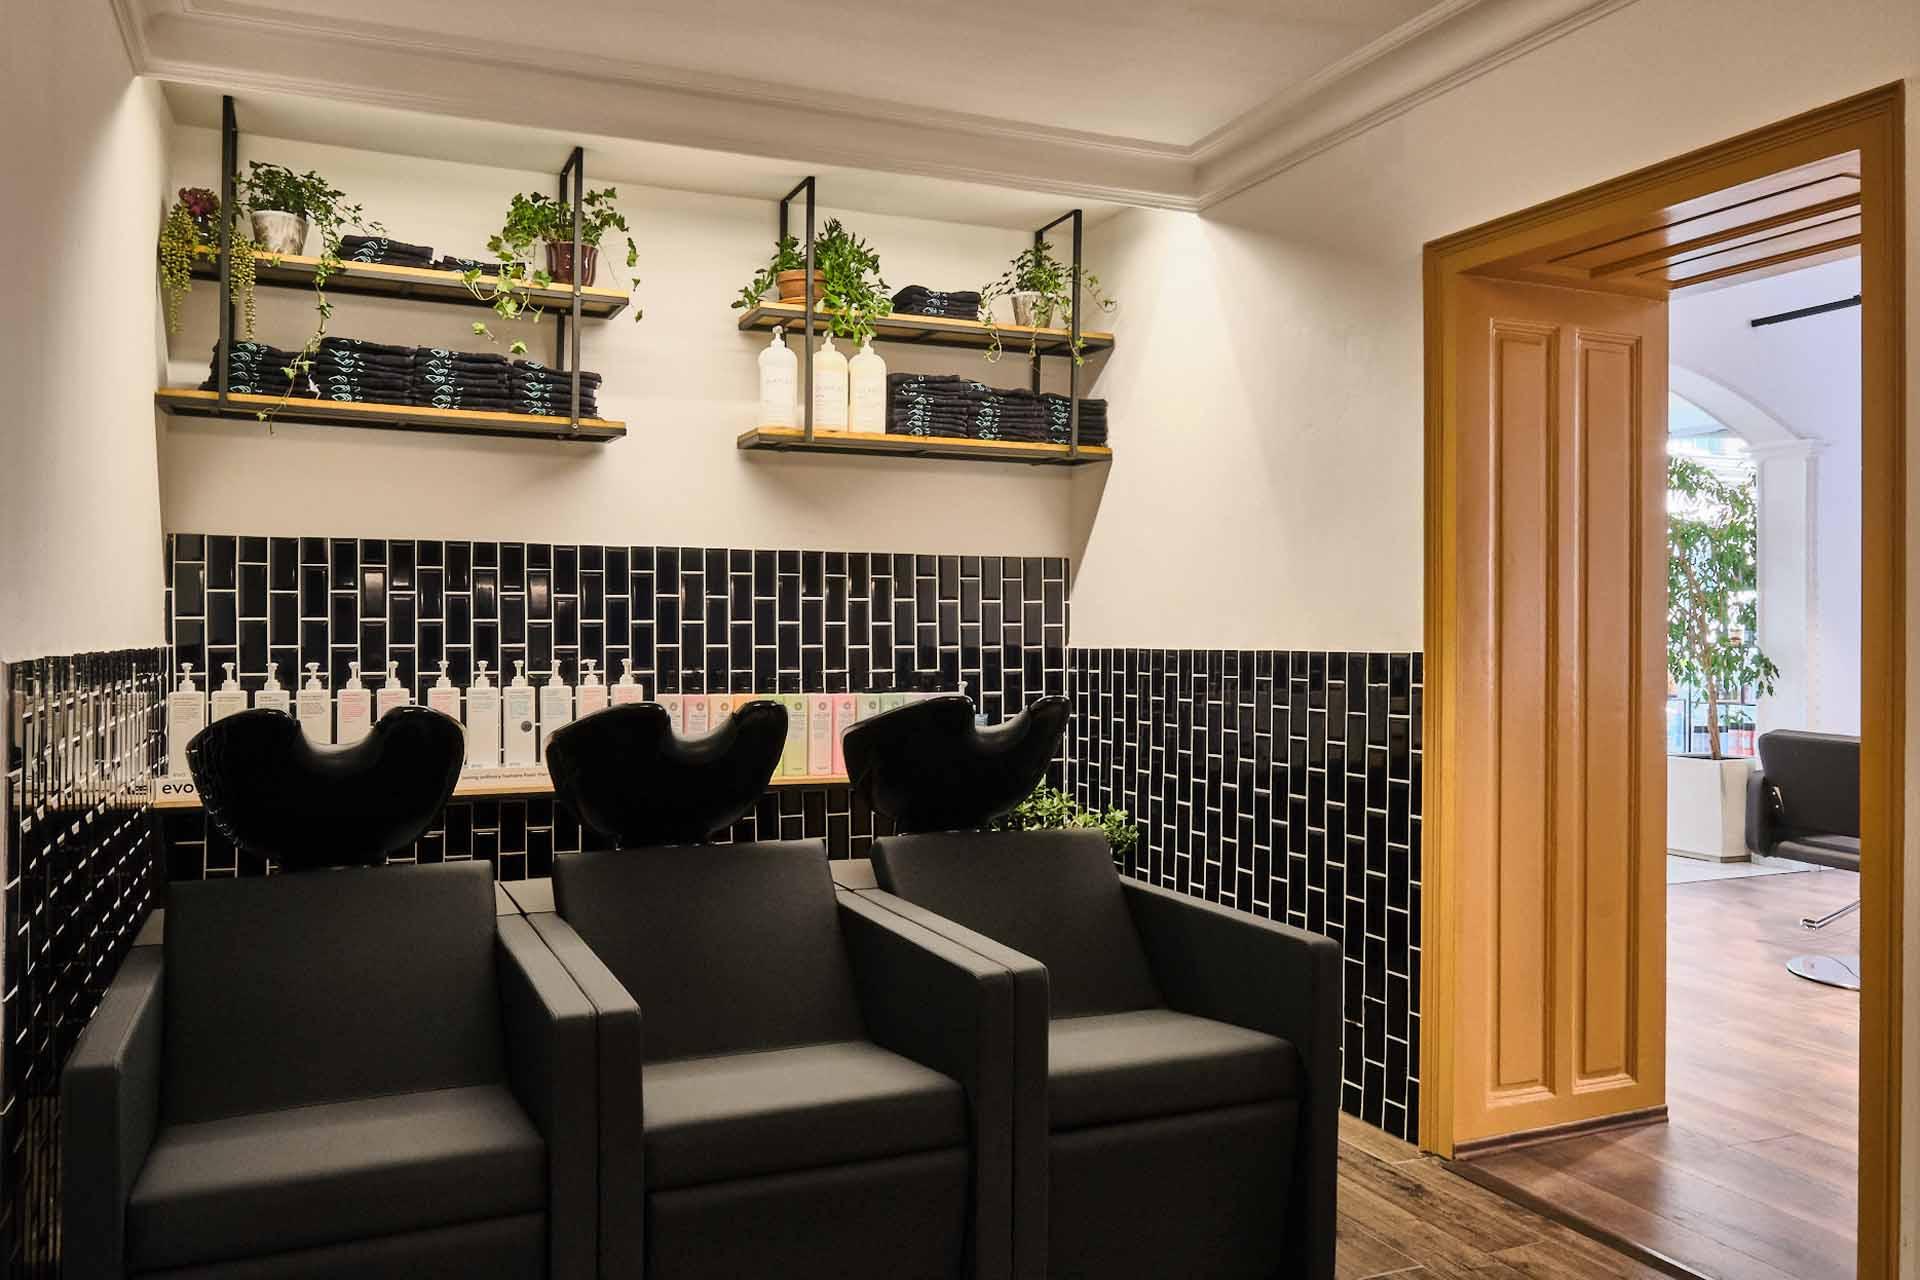 gumpendorfer+strasse+pahi+oslo+washingstation+highclass+top+friseur+hairdresser+ginger+lemon+hairspace+wien+interior+design.jpg